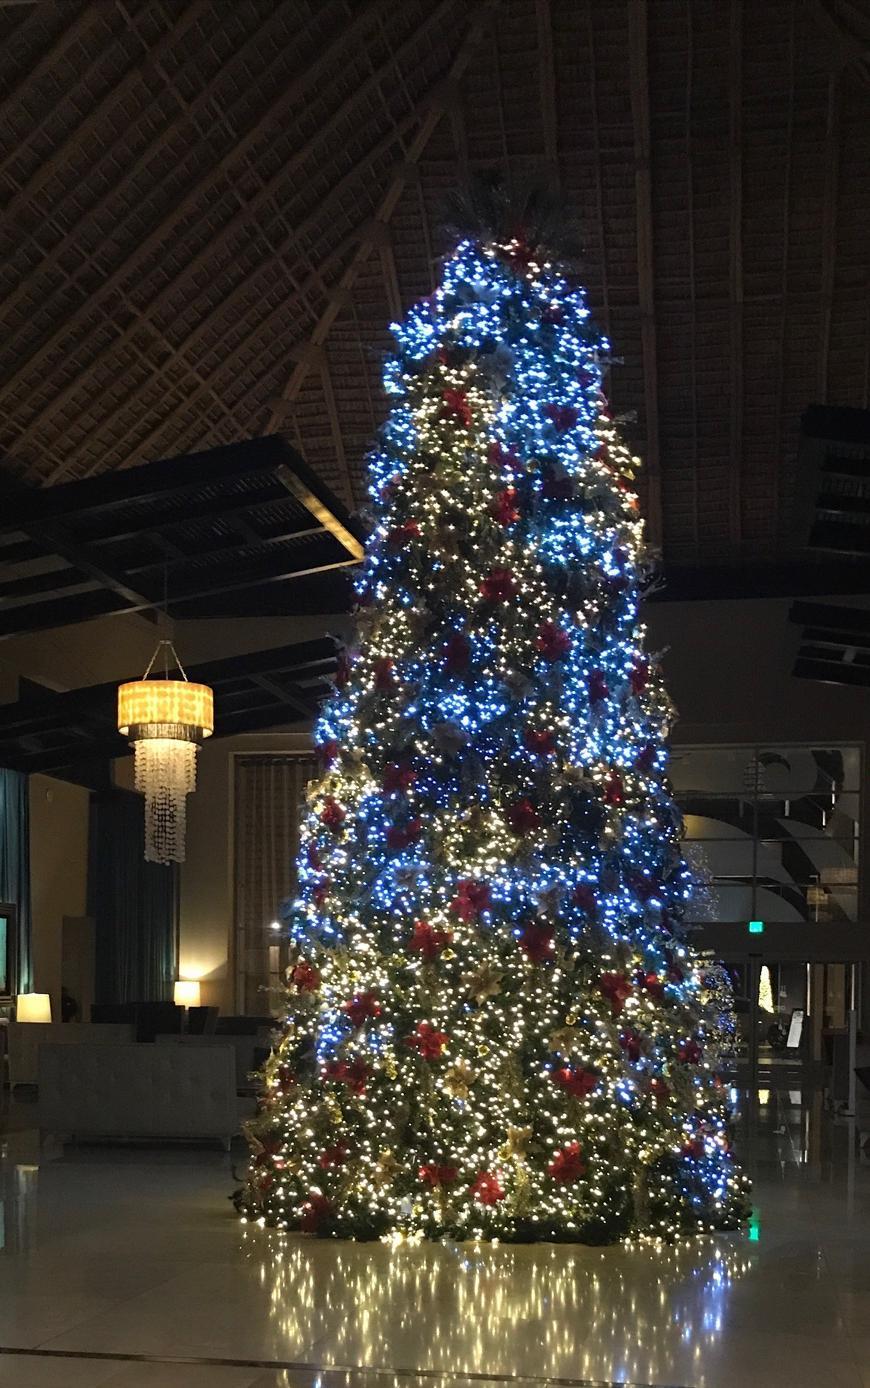 Christmas at the Hard Rock Hotel